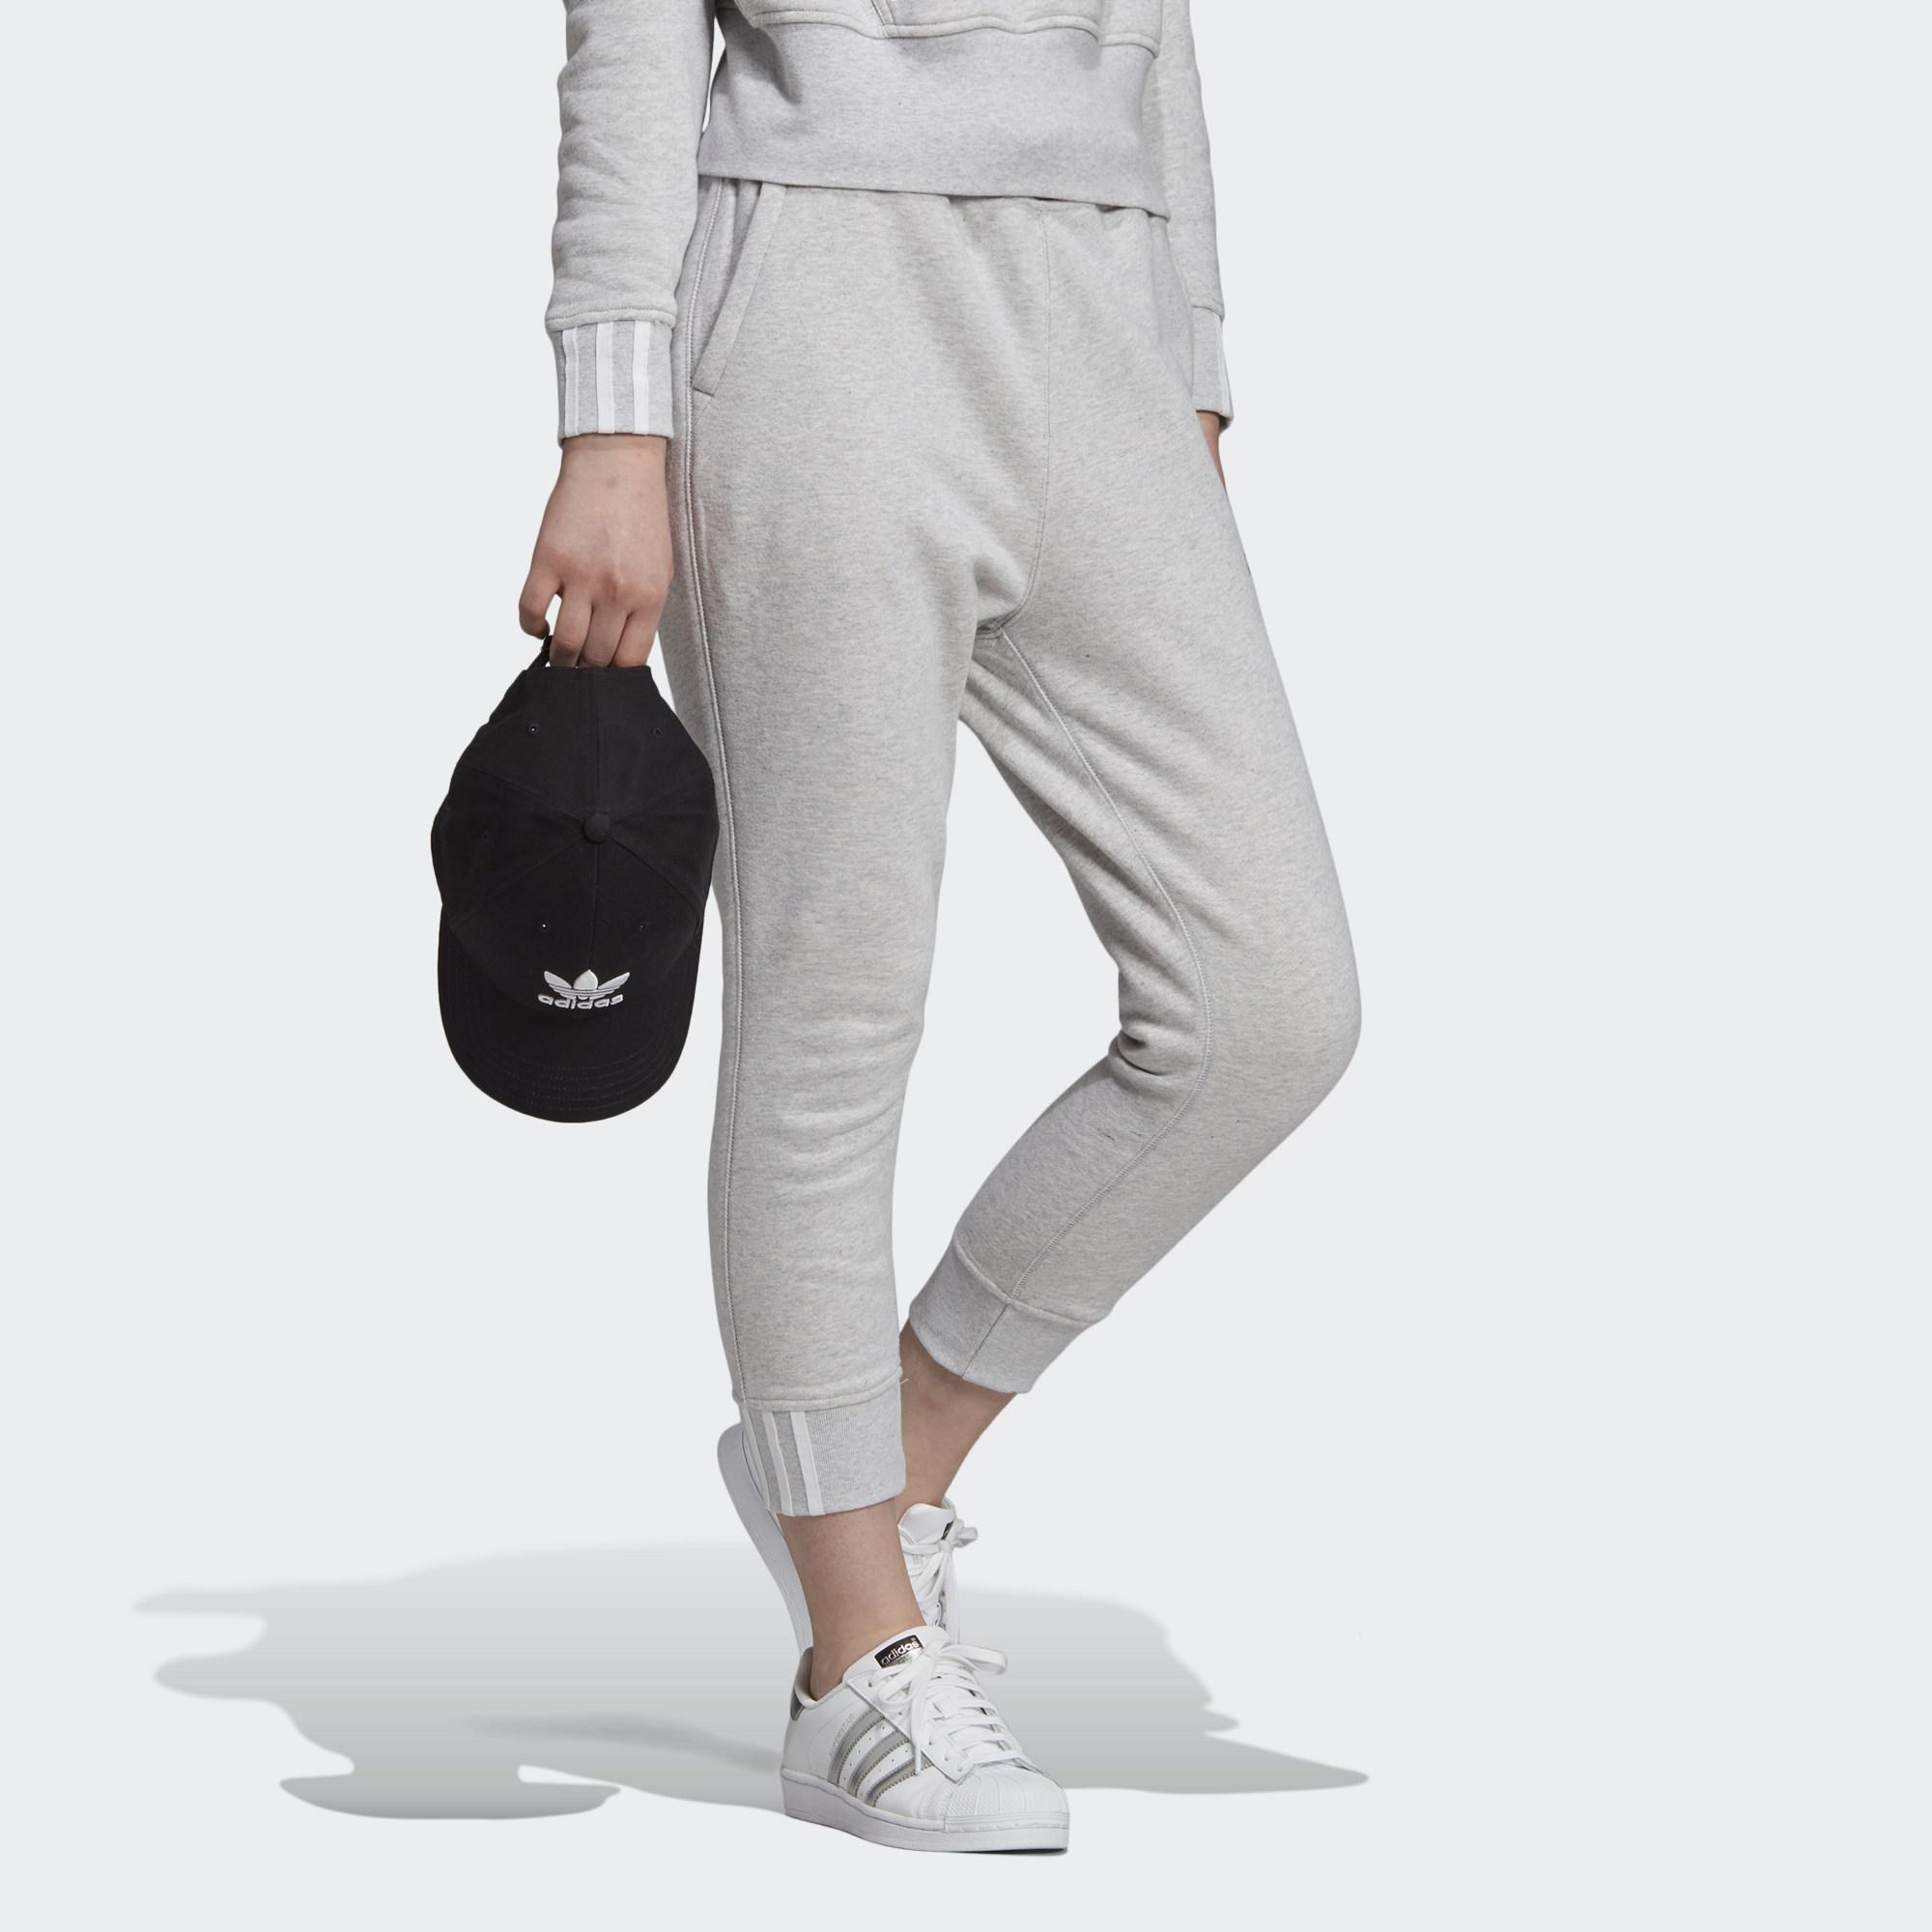 ADIDAS ORIGINALS 褲管寬鬆舒適的休閒版型 中腰設計 羅紋褲腳 100% 法國棉 兩側口袋;背面單口袋;可調式彈性腰頭設計 我們與瑞士良好棉花發展協會(Better Cotton Ini